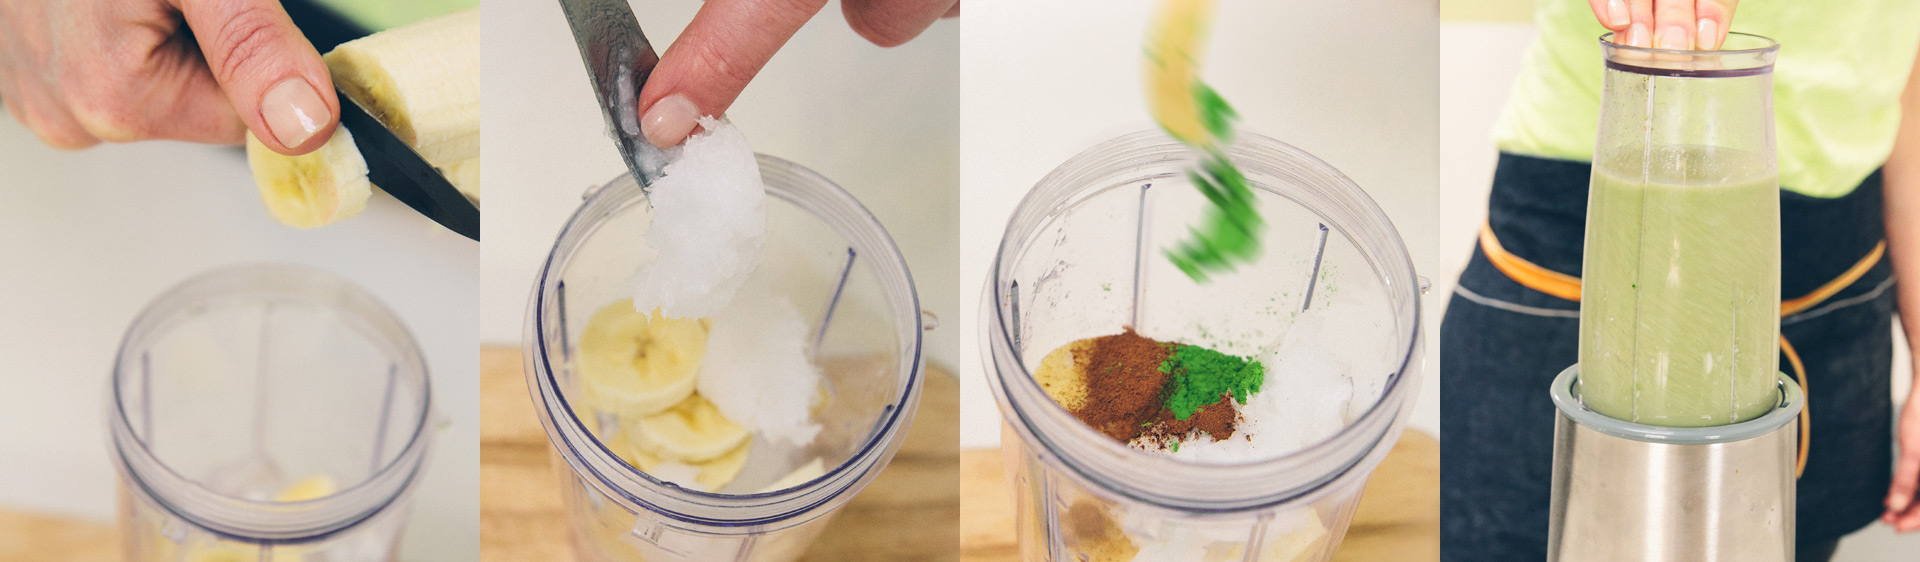 Matcha Green Tea Smoothies | Matcha Recipe | Matcha Source